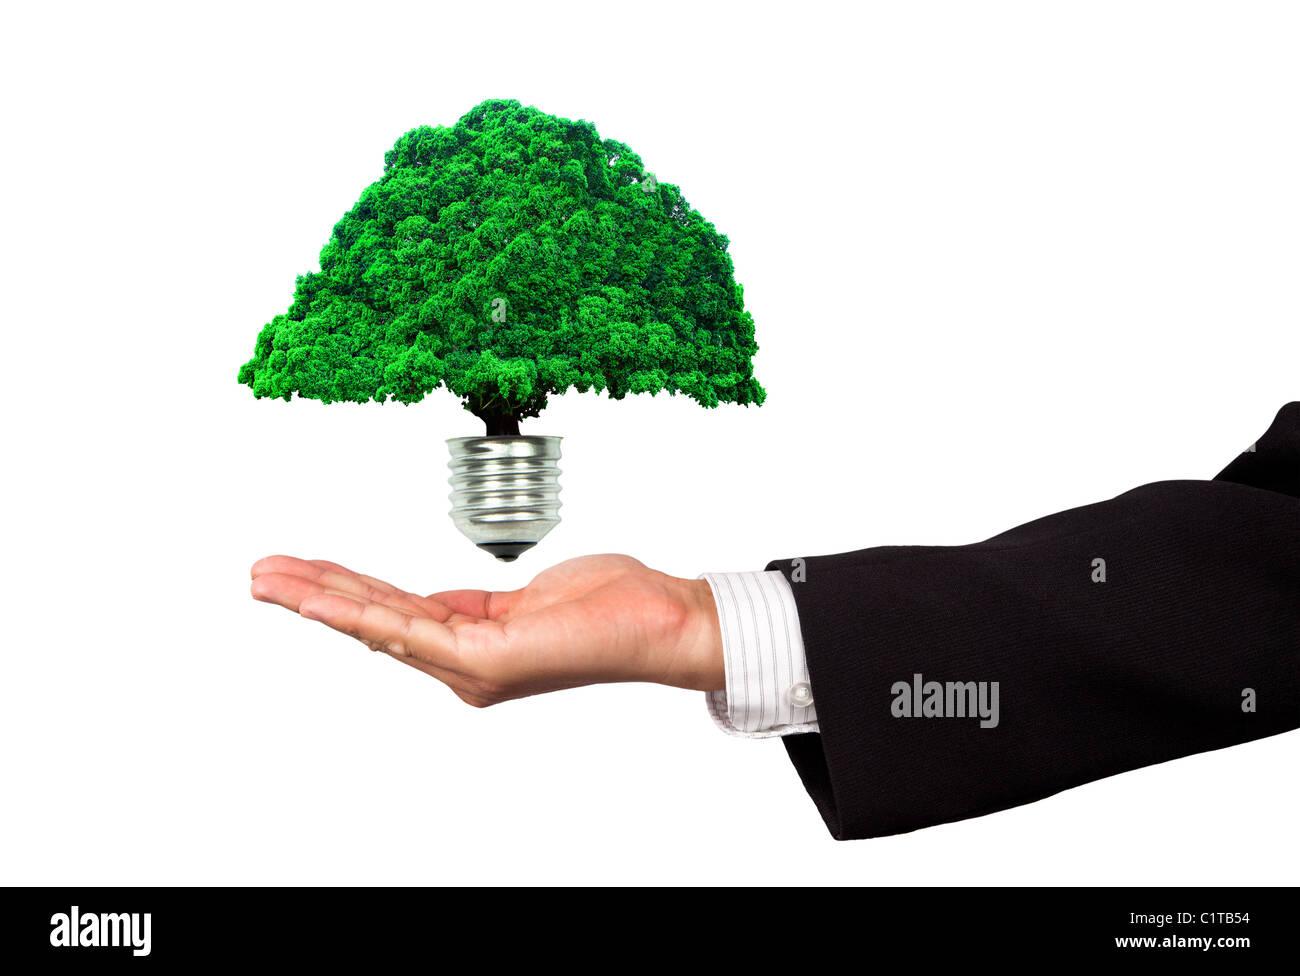 Negocio energético eco Imagen De Stock